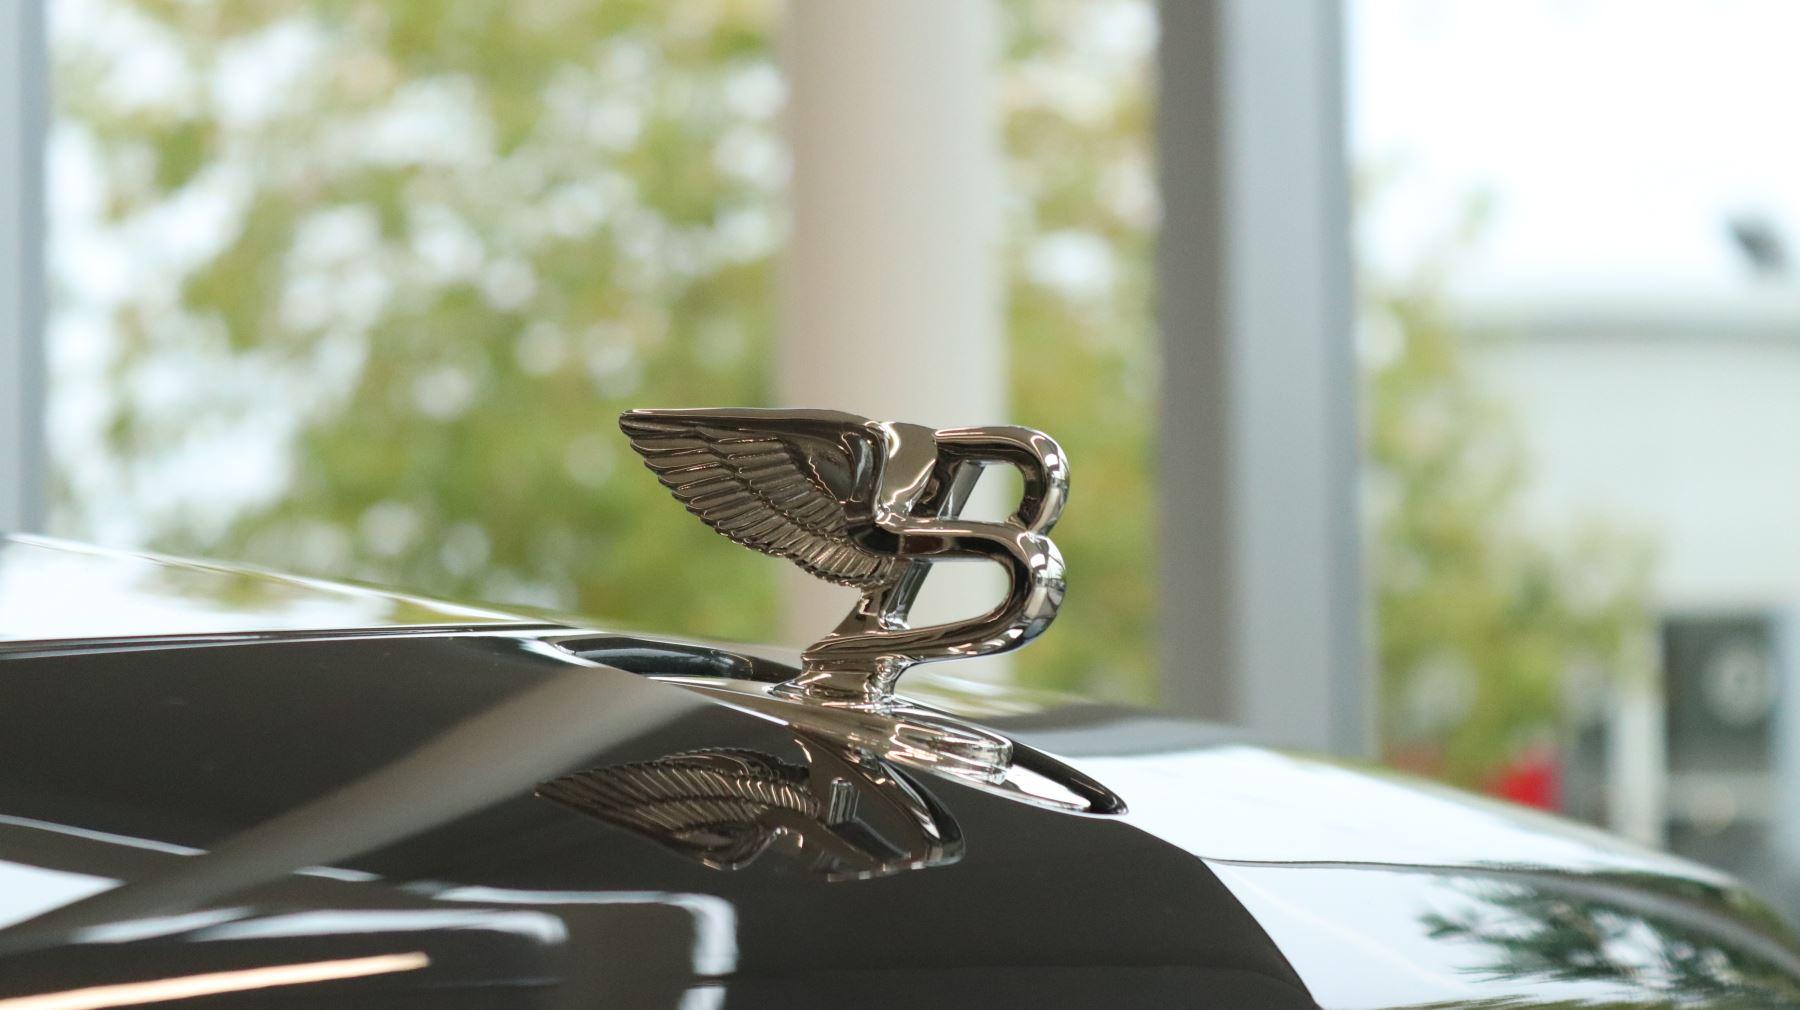 Bentley Mulsanne Speed 6.8 V8 Speed Auto image 4